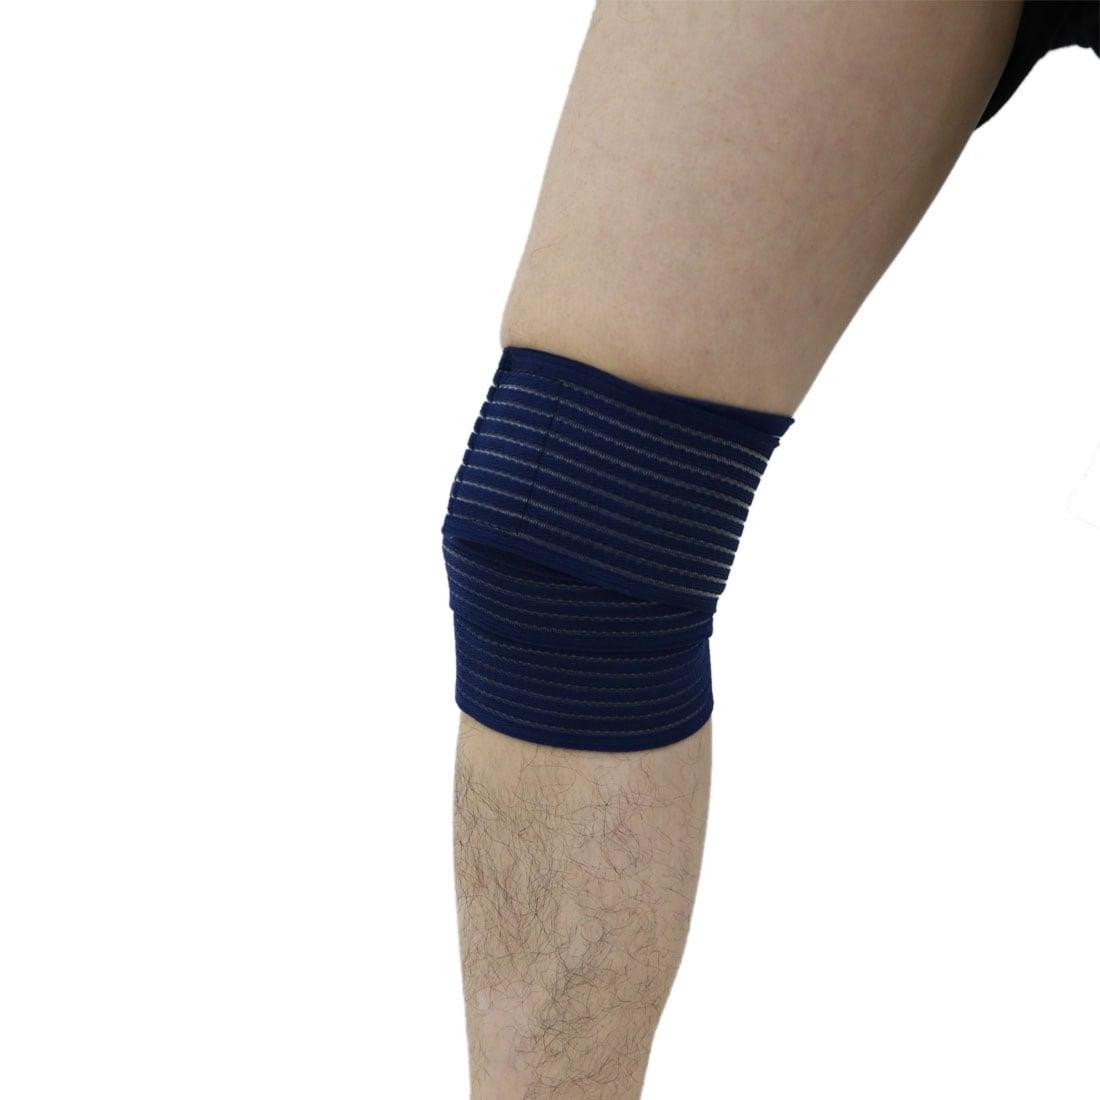 Shop Unique Bargains Navy Hook Loop Closure Knee Support Wrap